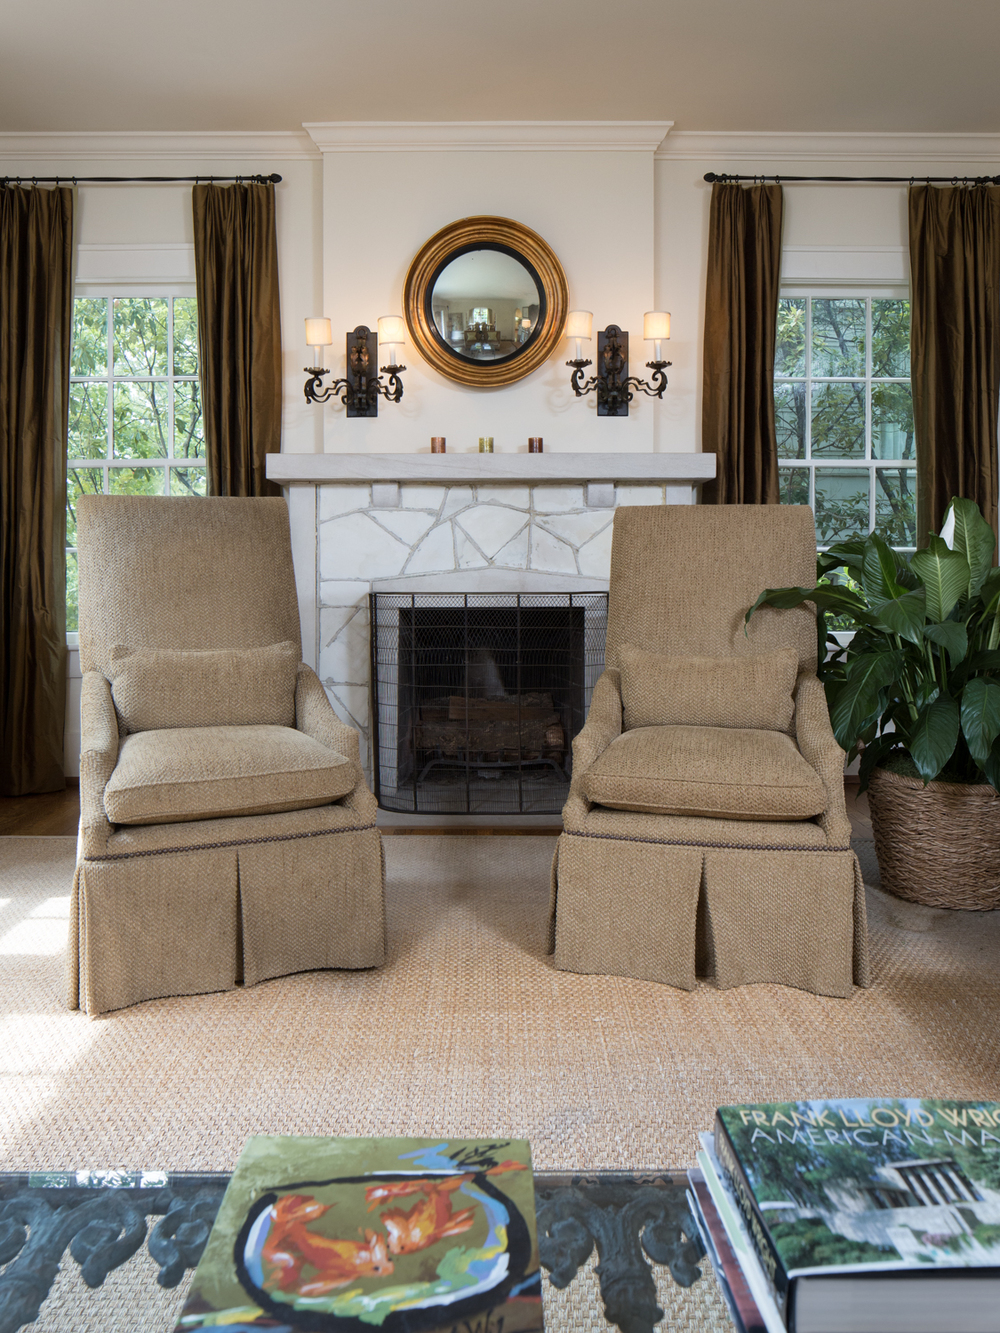 819 Conroy Rd - Birmingham AL Real Estate Photography3456.jpg